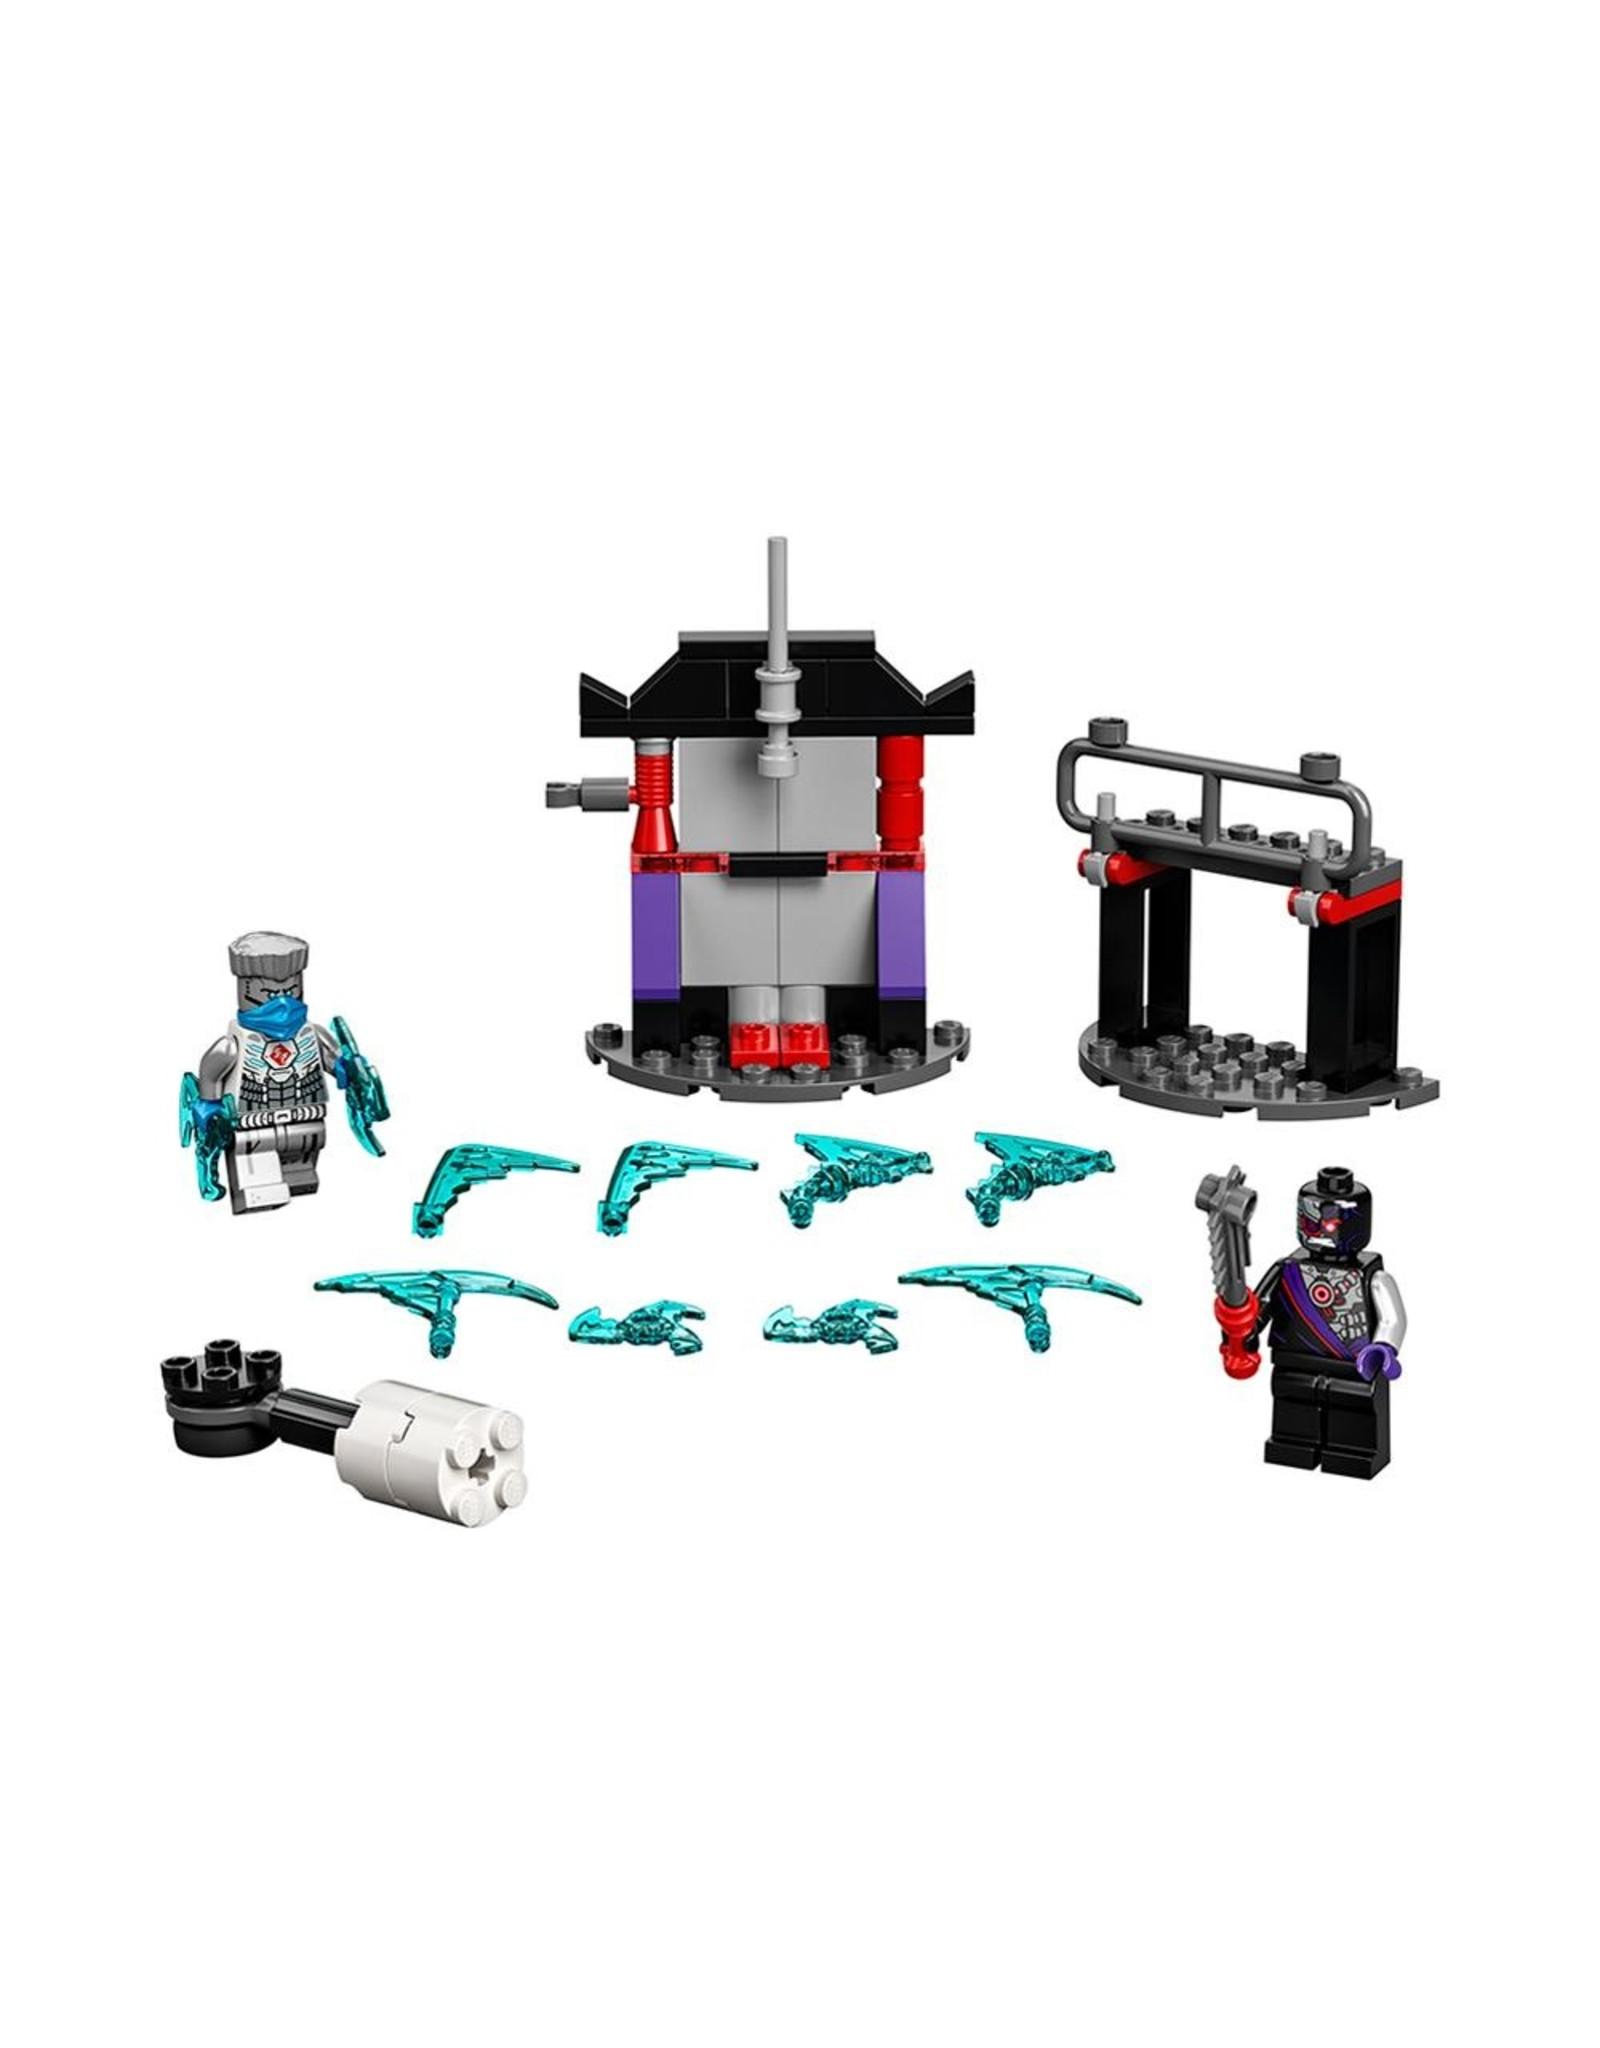 LEGO Ninjago 71731 Epic Battle Set - Zane vs. Nindroid